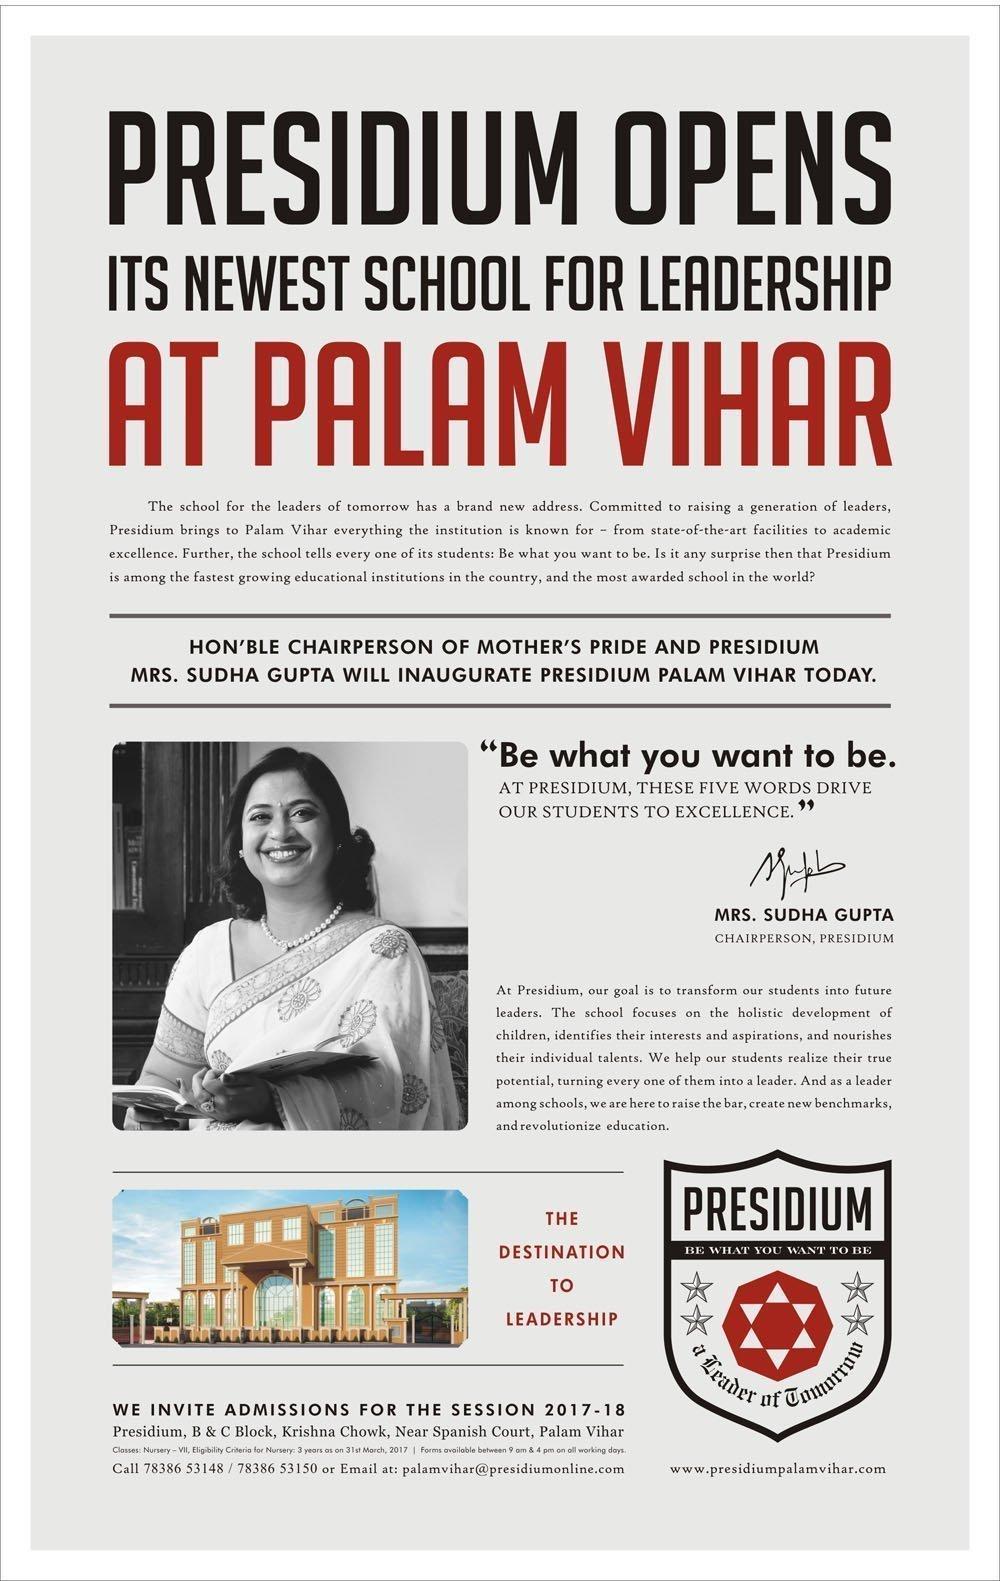 PRESIDIUM OPENS ITS NEWEST SCHOOL FOR LEADERSHIP AT PALAM VIHAR